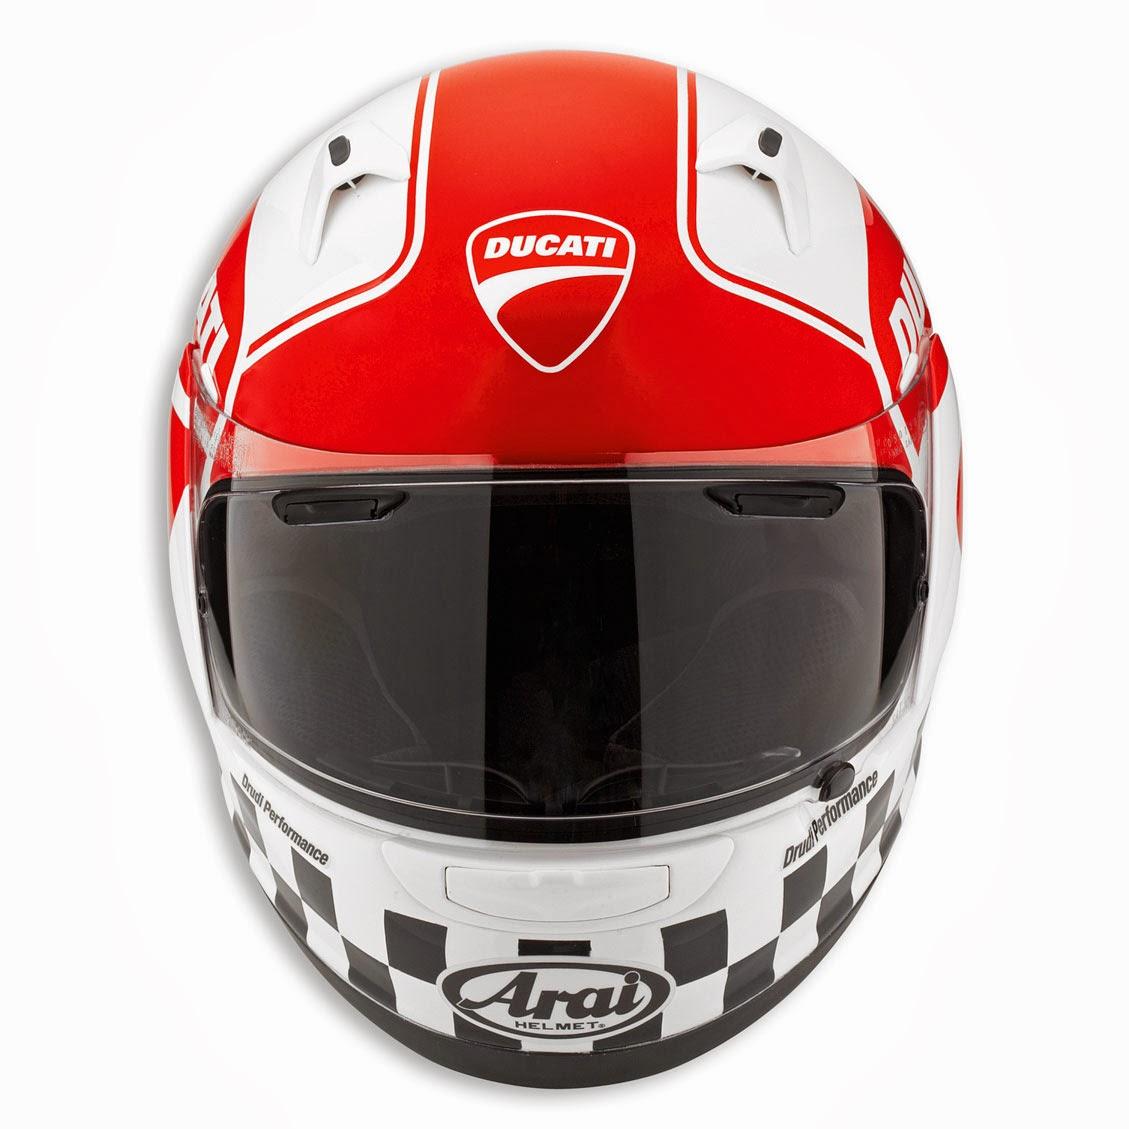 Arai Hayden Ducati